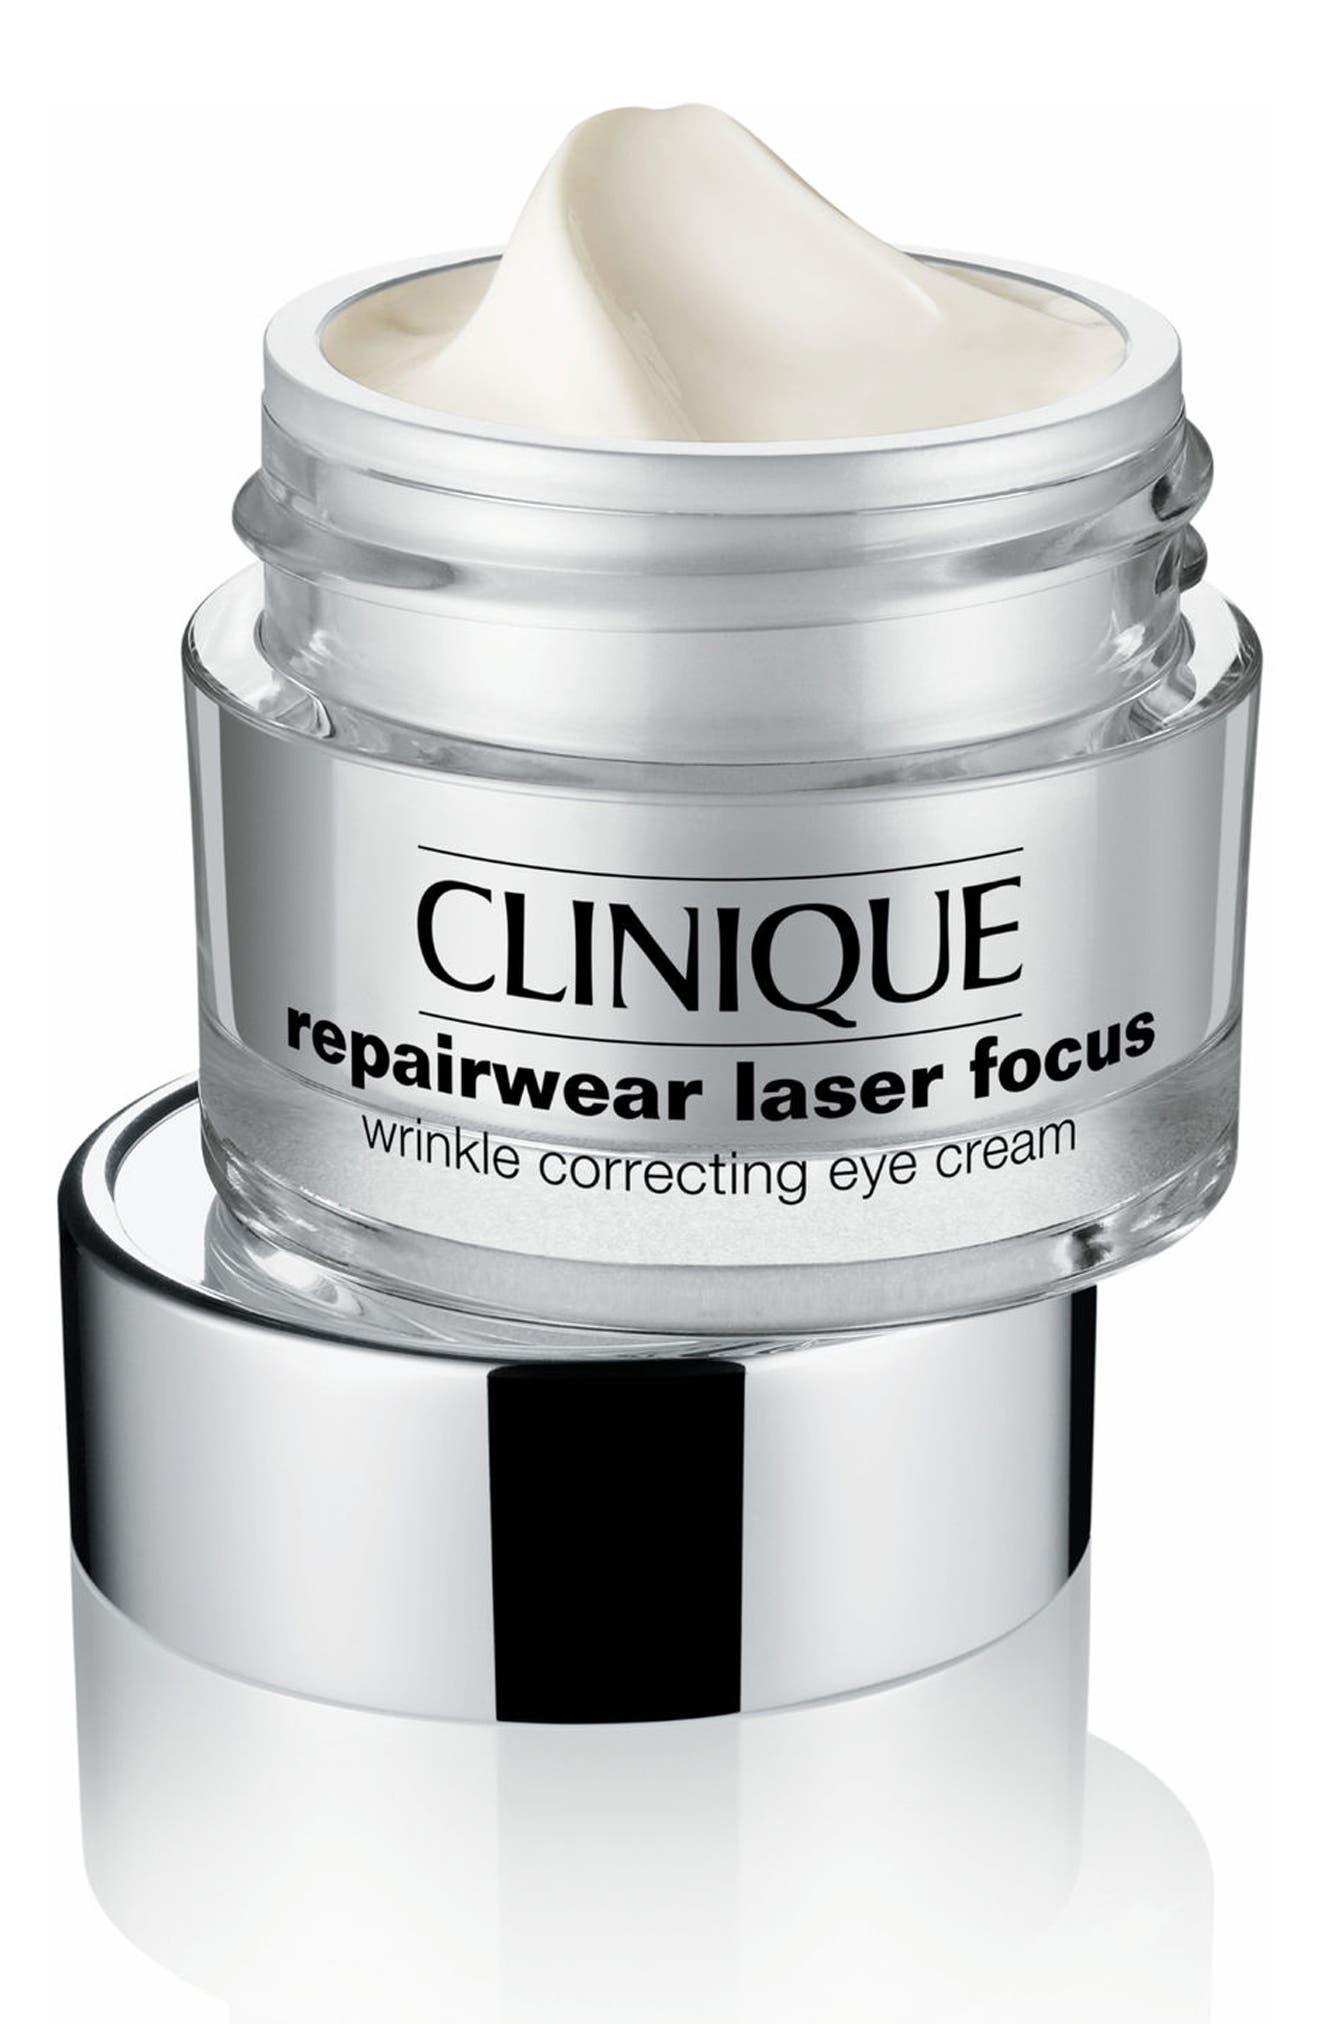 CLINIQUE,                             Repairwear Laser Focus Wrinkle Correcting Eye Cream,                             Alternate thumbnail 2, color,                             NO COLOR